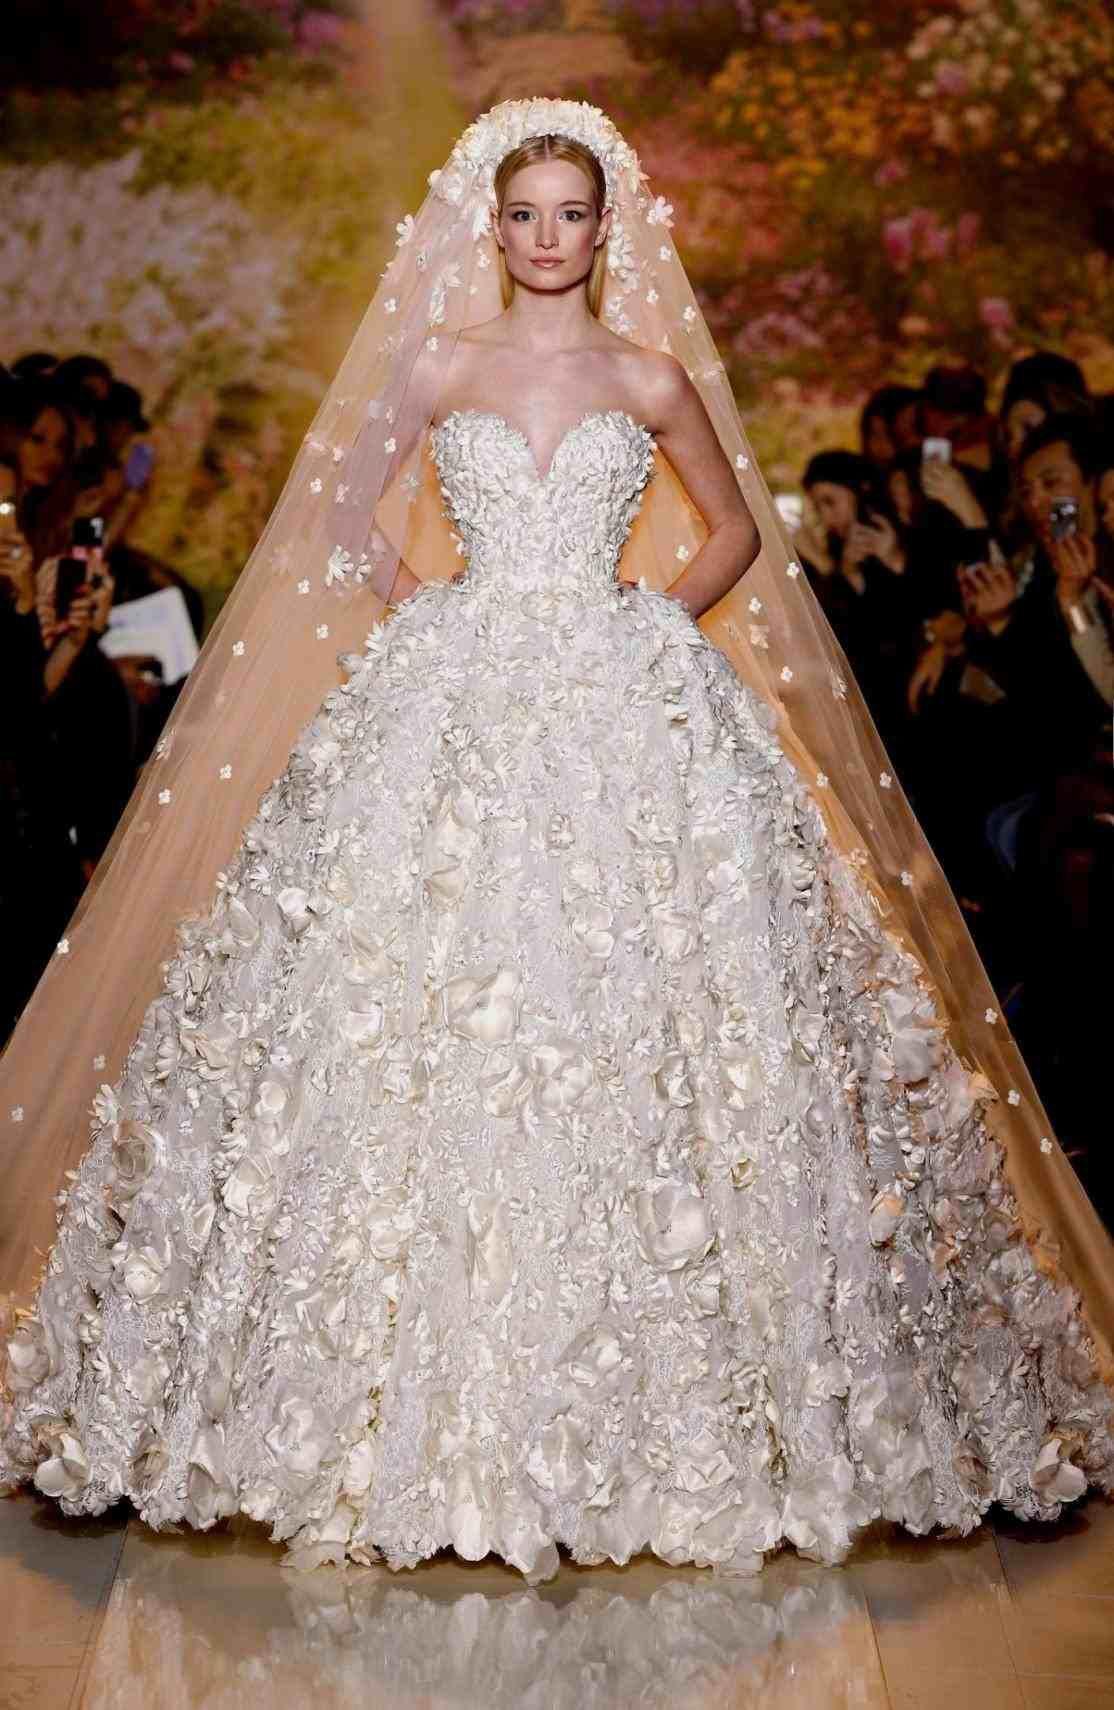 Top 10 New Post Most Beautiful Wedding Dresses Celebrity Visit Wedbridal Site